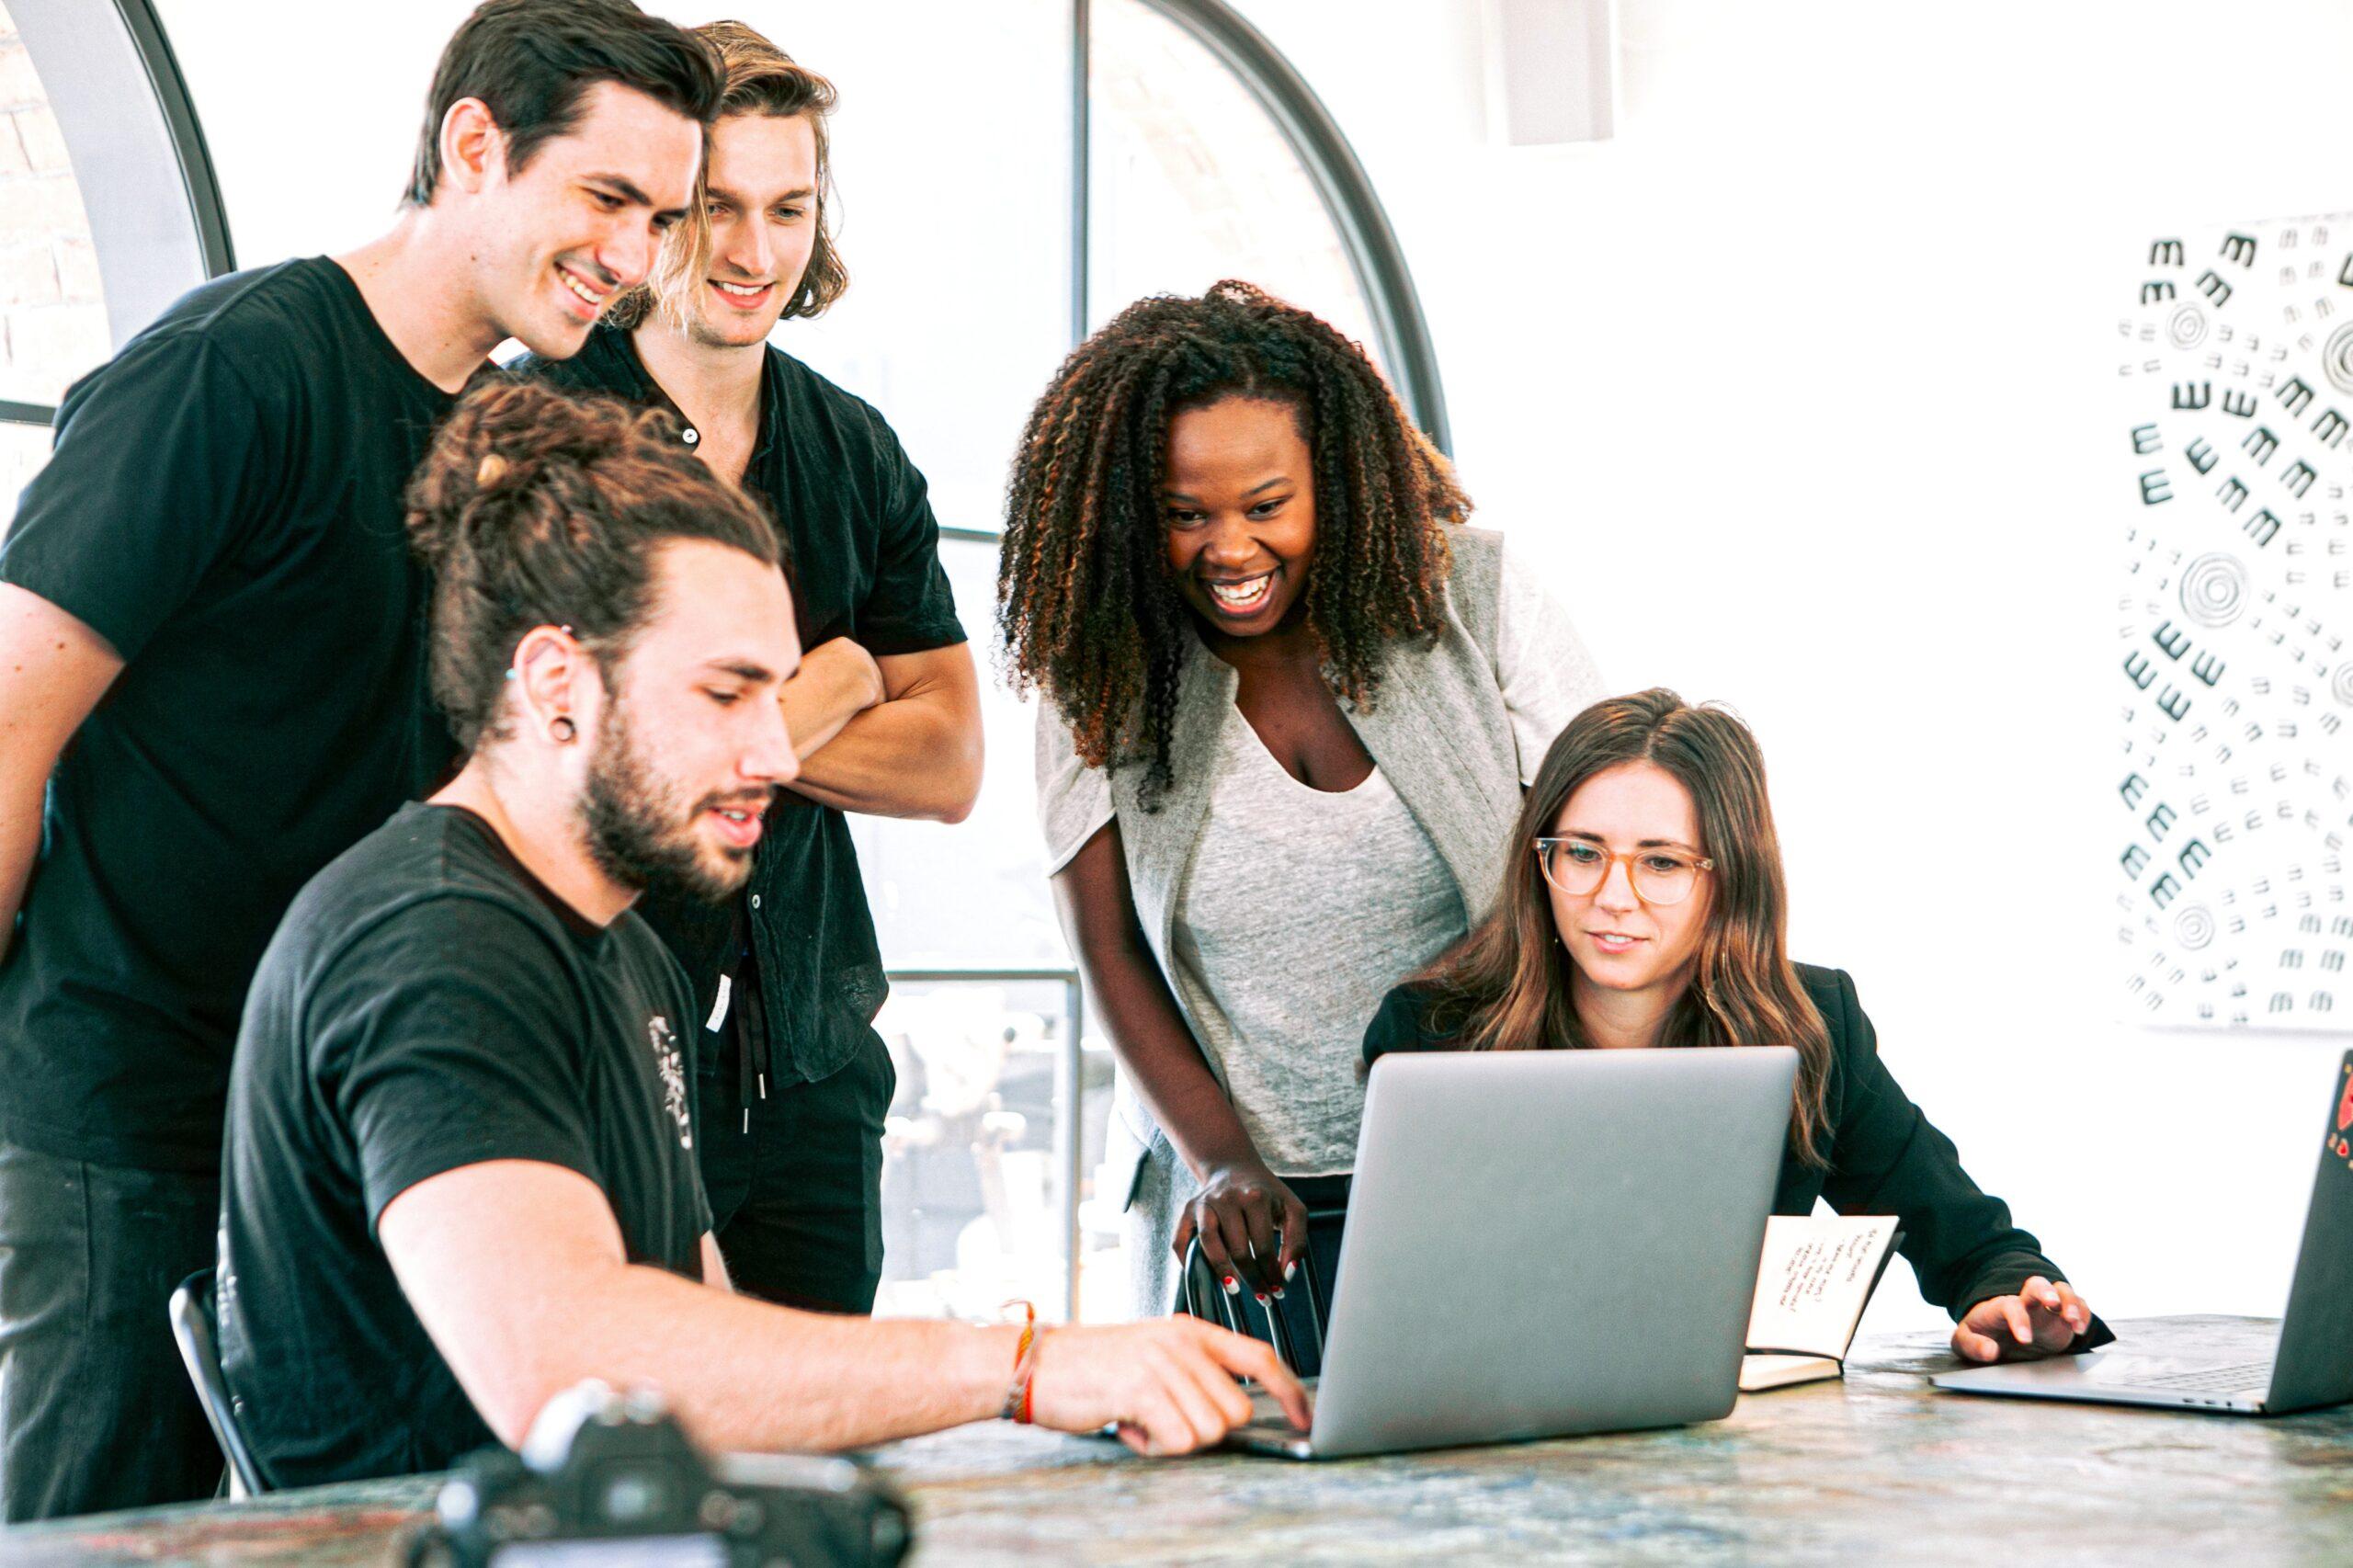 laptop-office-working-men-3153201